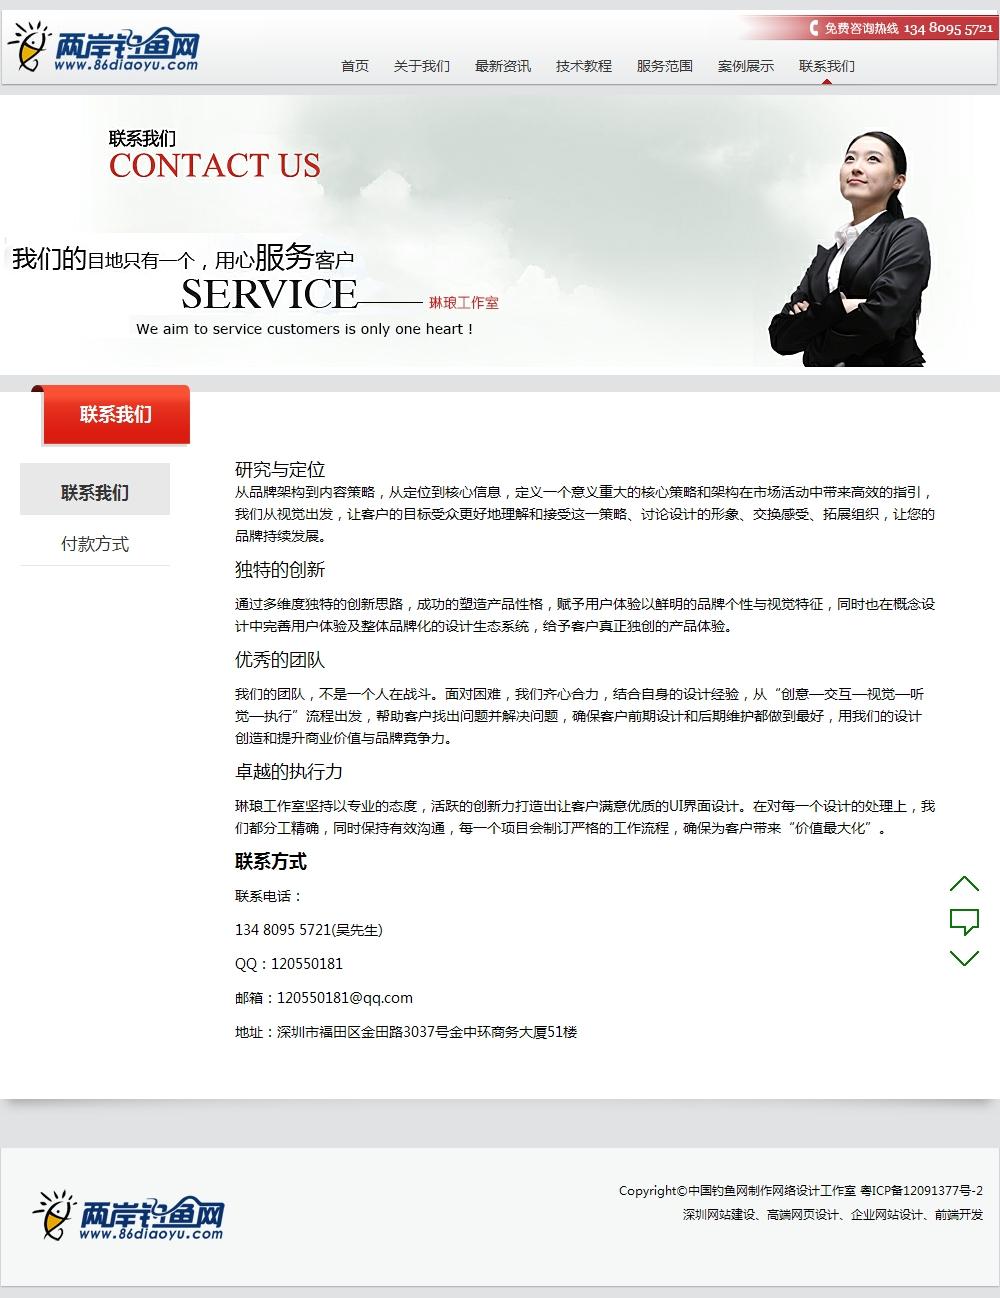 dedecms模板_独家超帅瀑布流网站制作公司模板